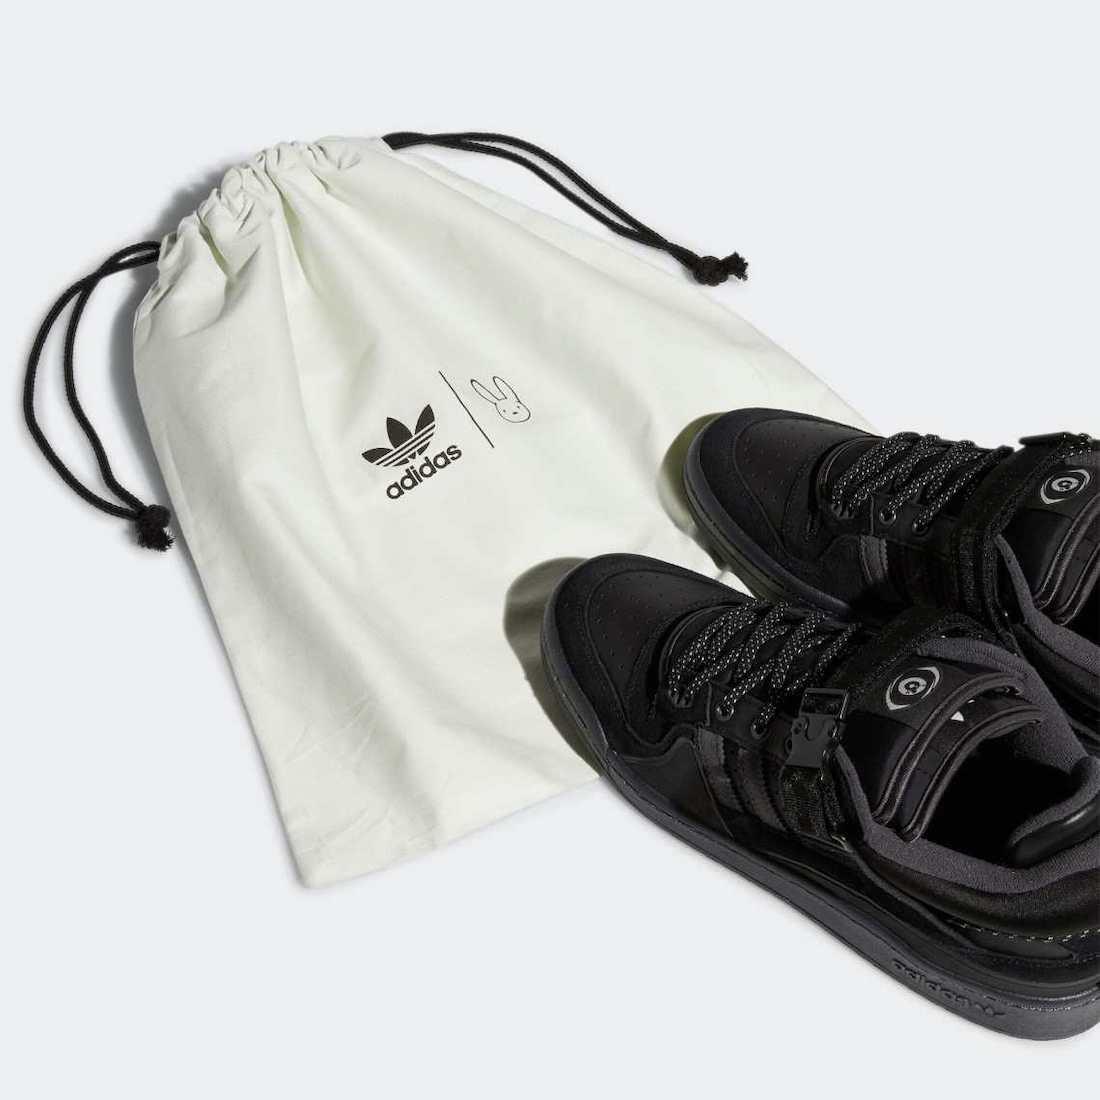 Bad-Bunny-adidas-Forum-Buckle-Low-Core-Black-GW5021-Release-Date-1